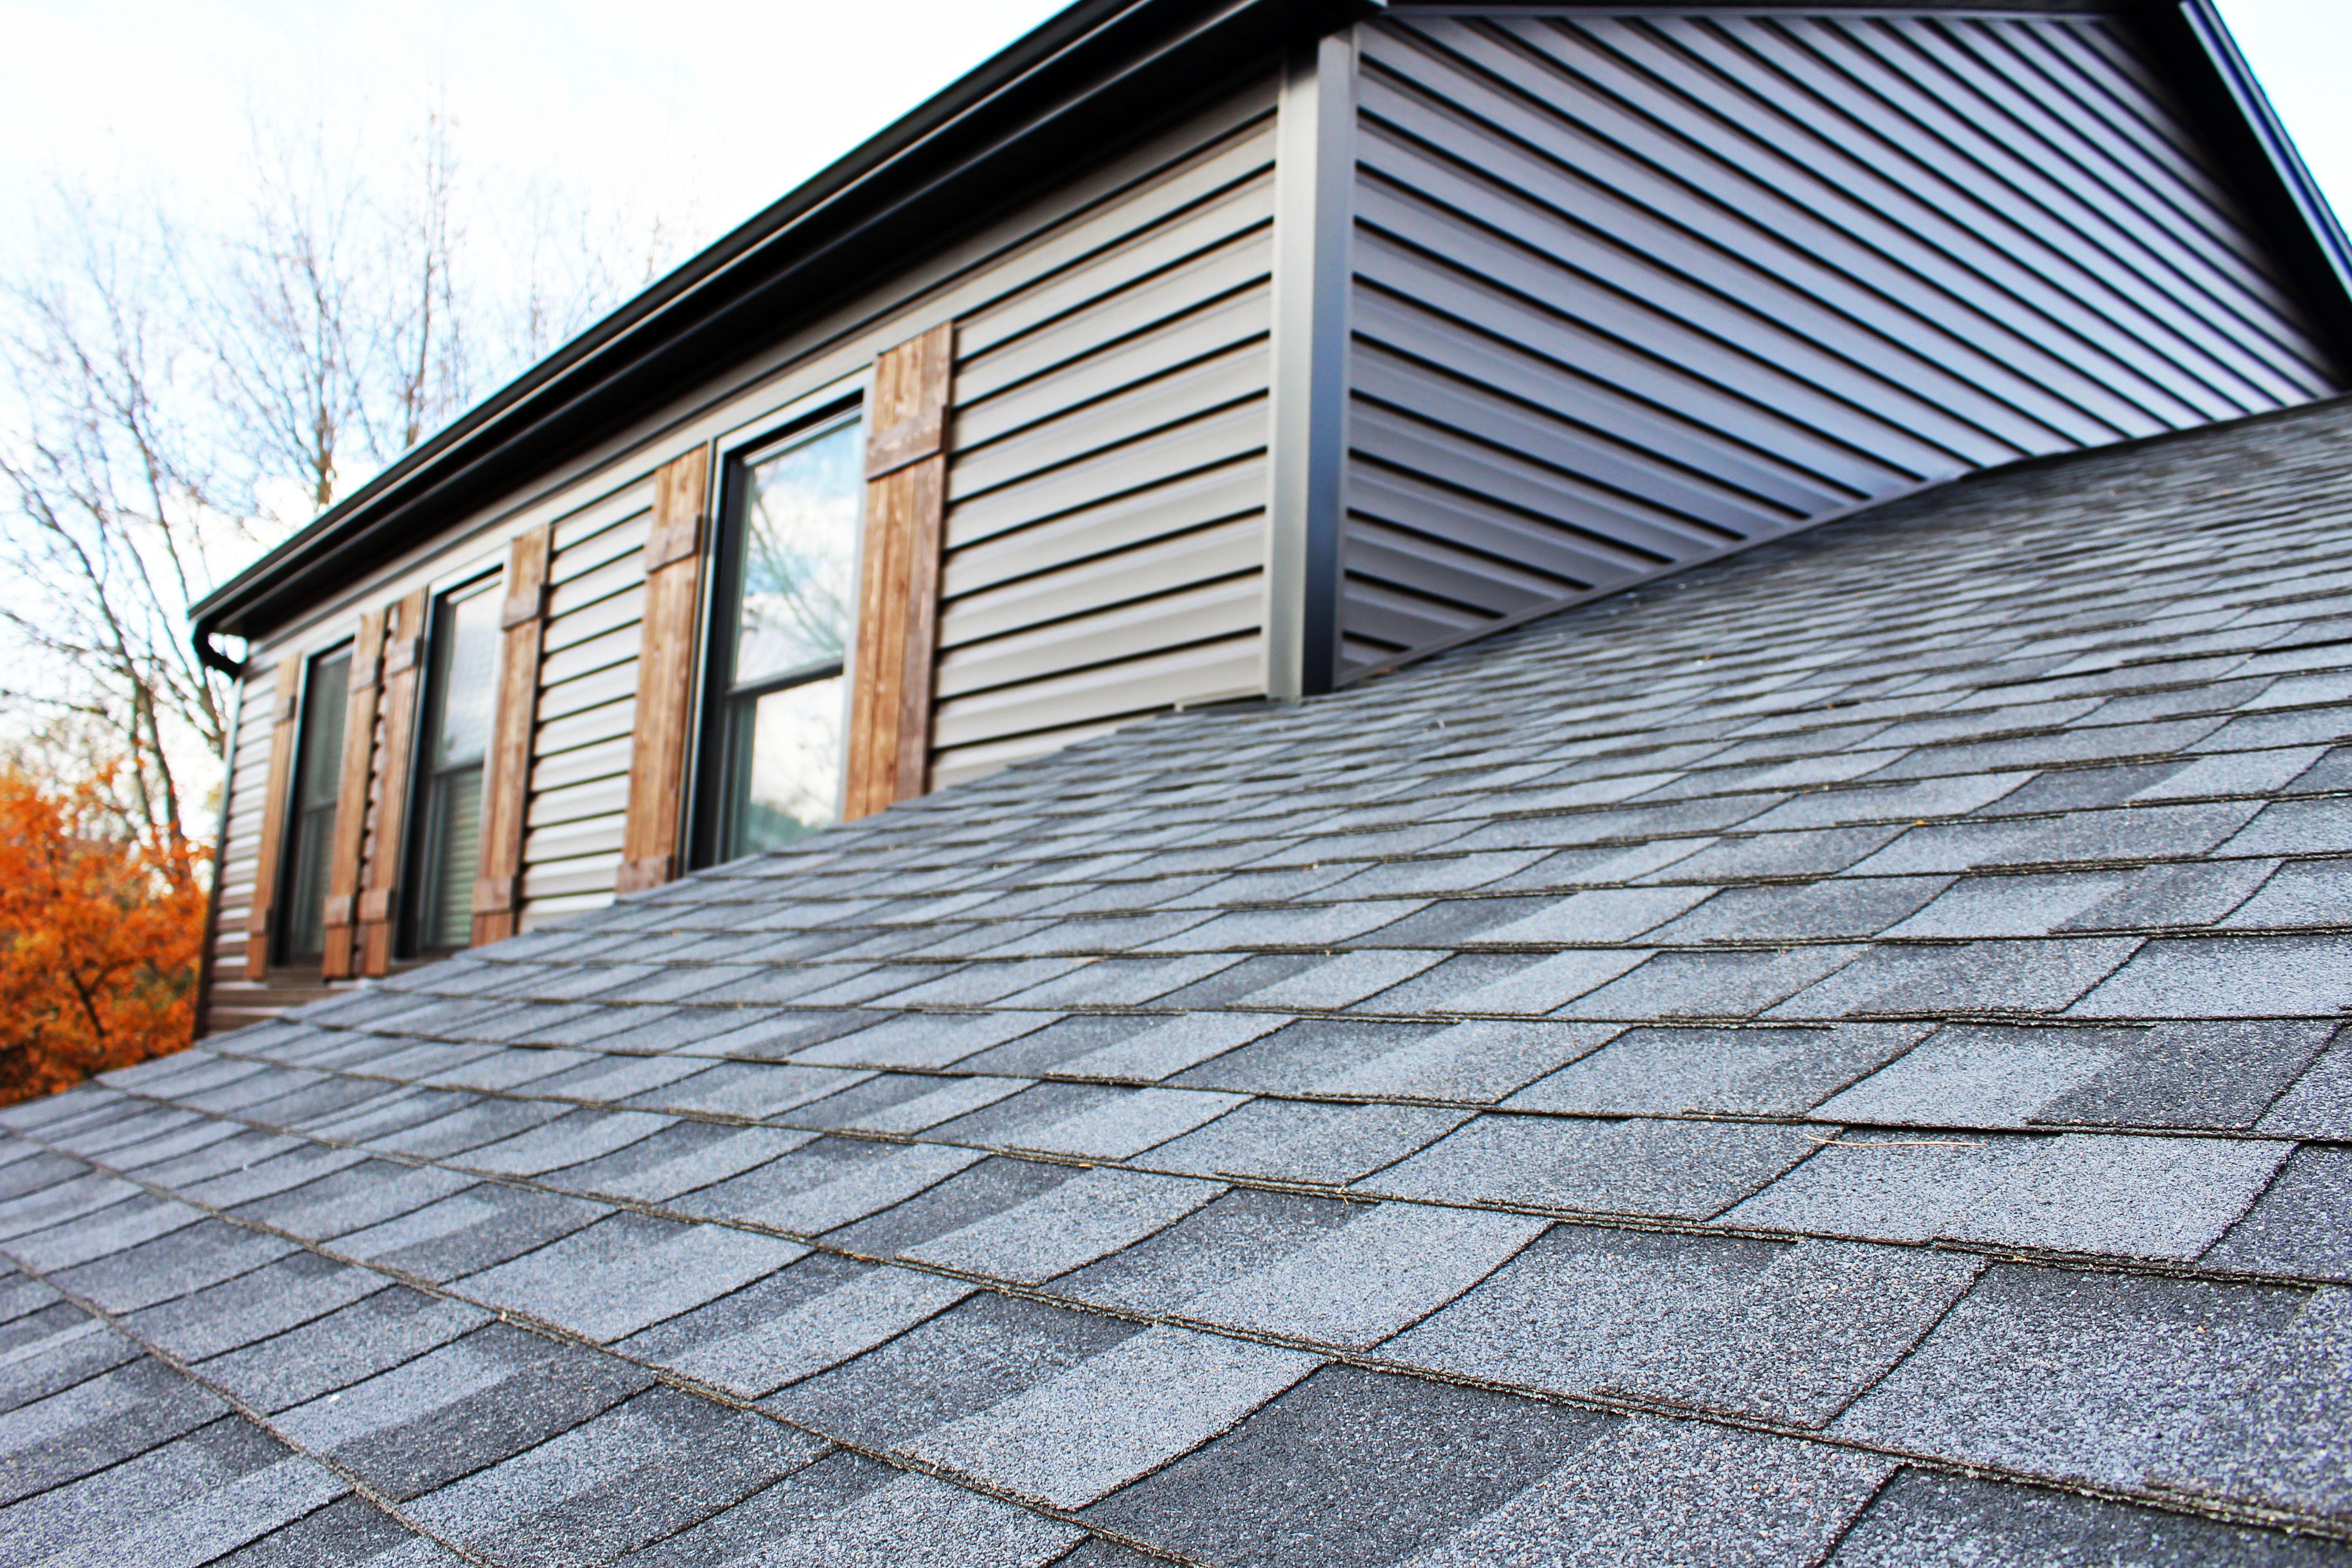 Roof Certainteed Landmark Pro Moire Black Siding Certainteed Monogram Slate Gutters Soffit Fascia Black Shingle Colors Roofing Home Remodeling